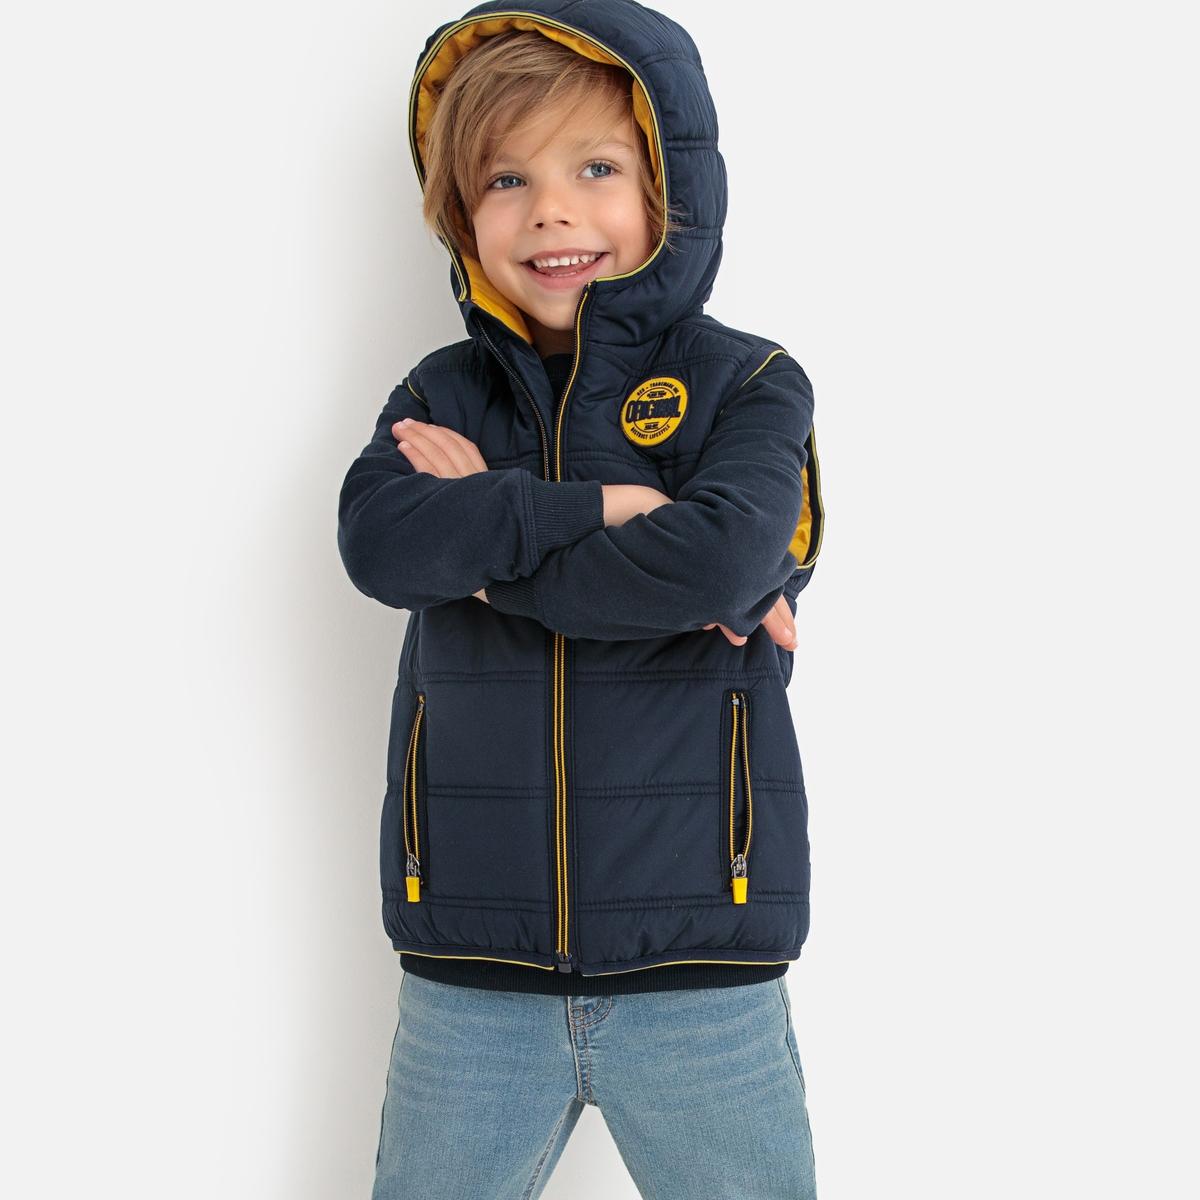 цена Куртка La Redoute Без рукавов с капюшоном 3 года - 94 см синий онлайн в 2017 году